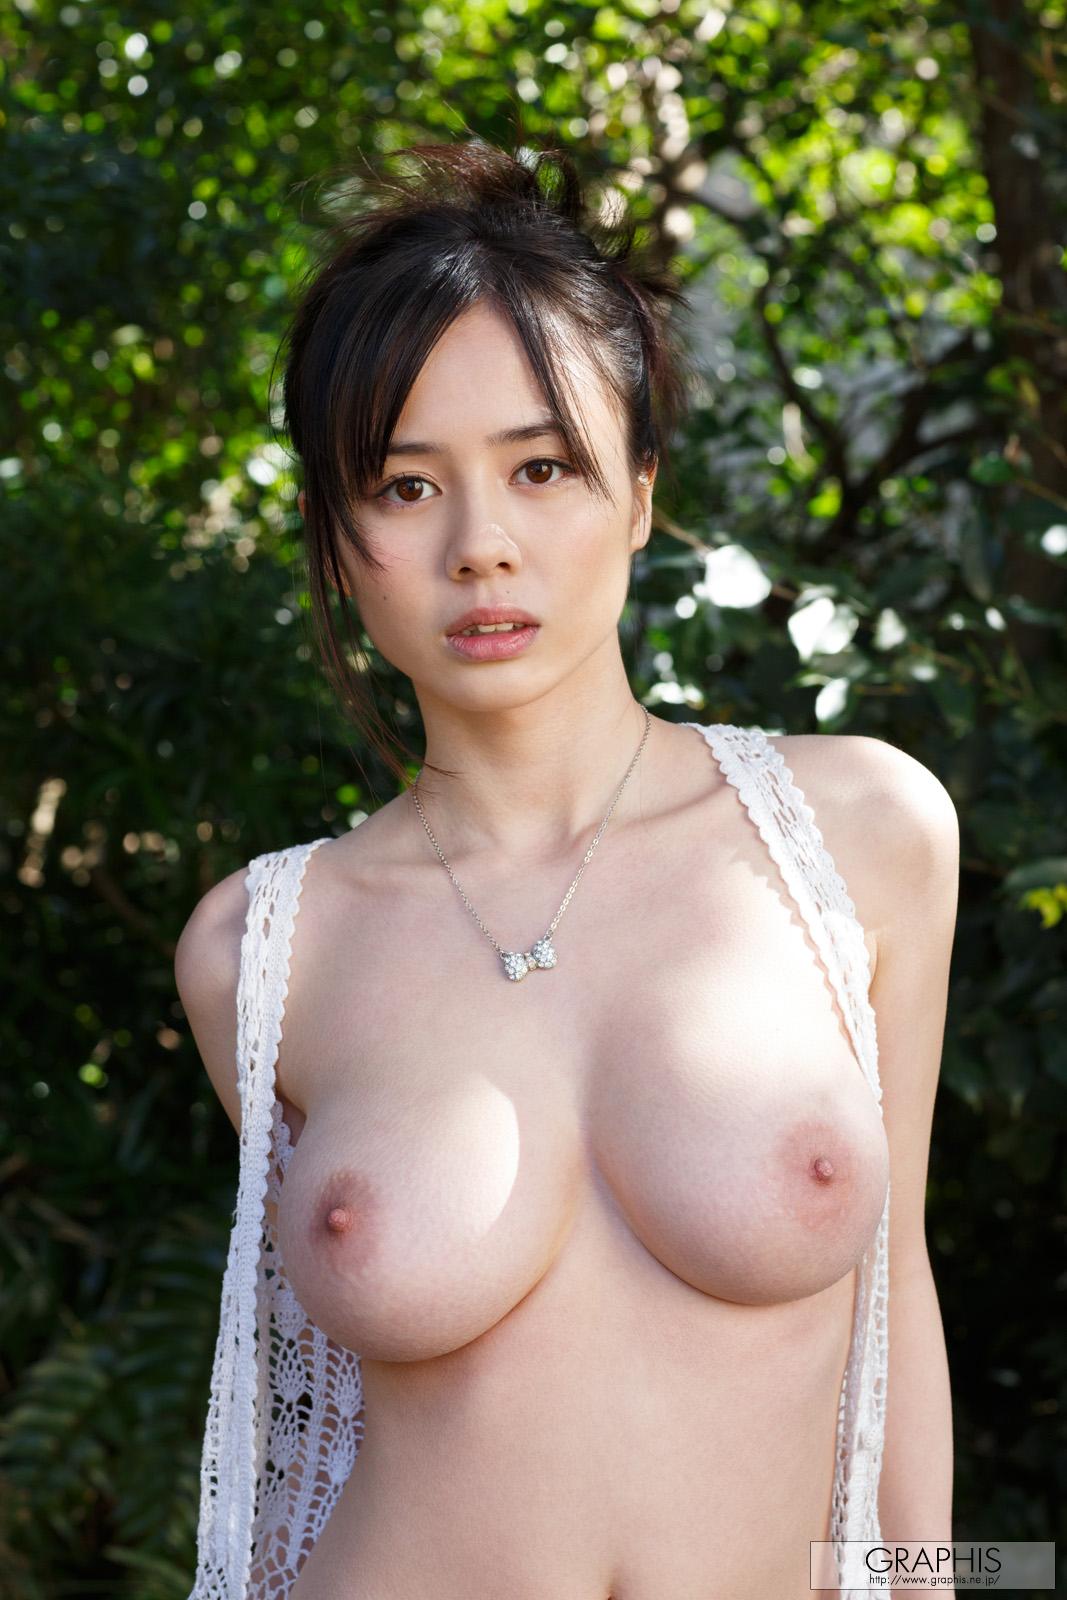 Aimi Yoshikawa aimi yoshikawa porn pic - eporner